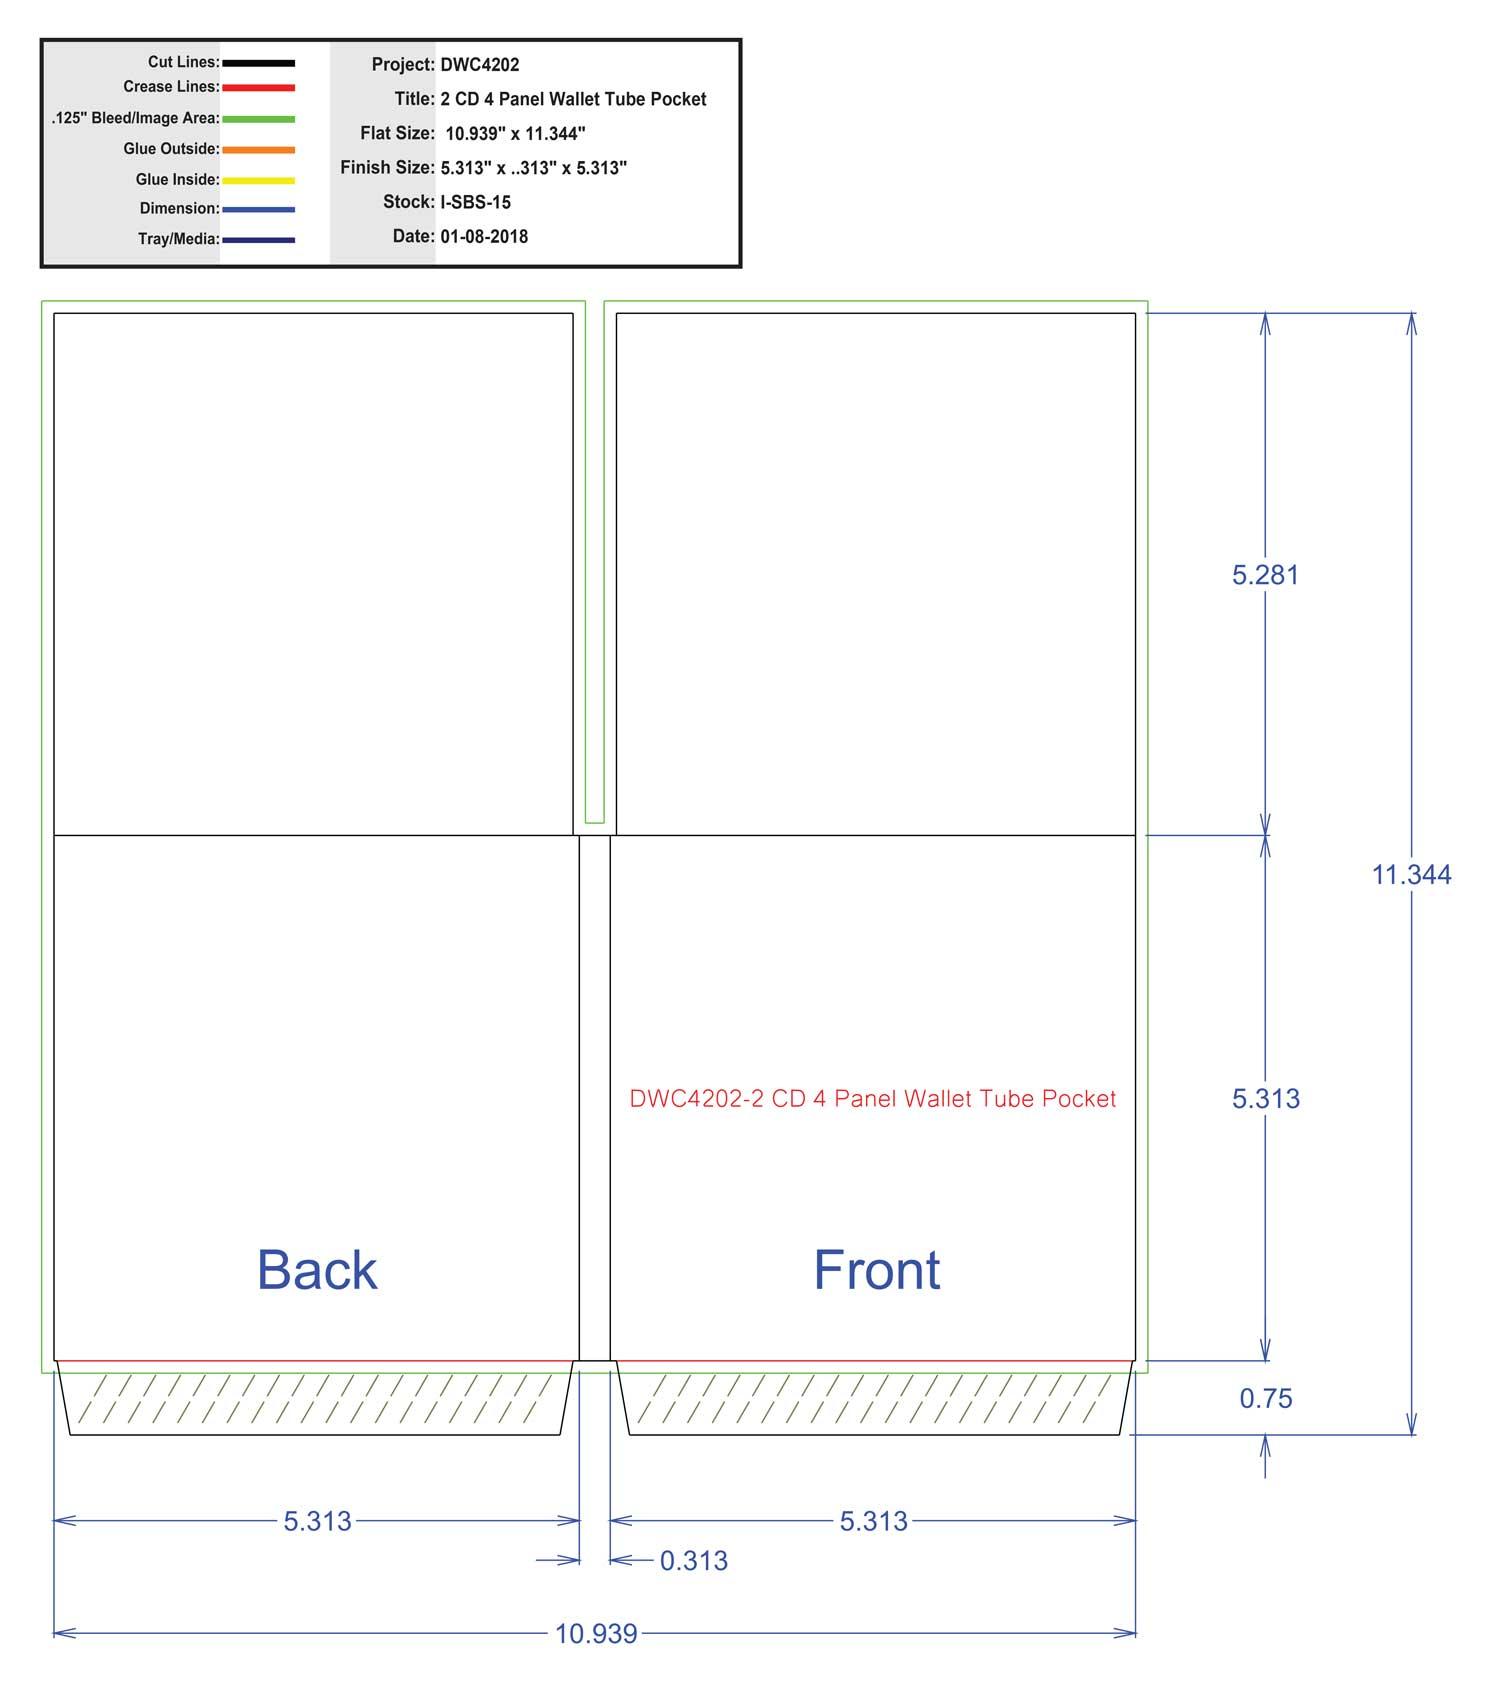 DWC4202 4 panel Tube Pocket